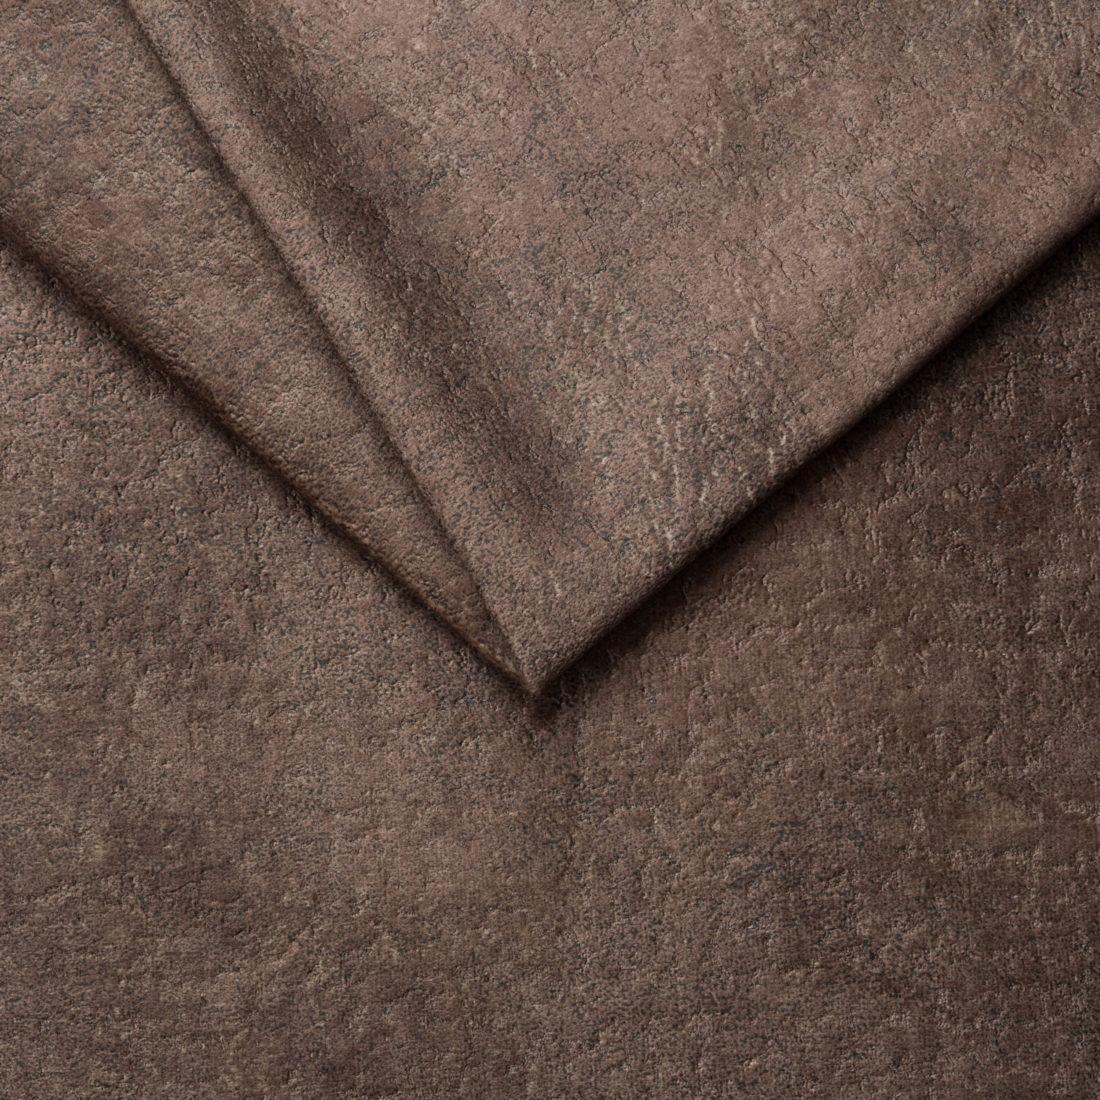 Мебельная ткань Infinity 3 Mink, велюр